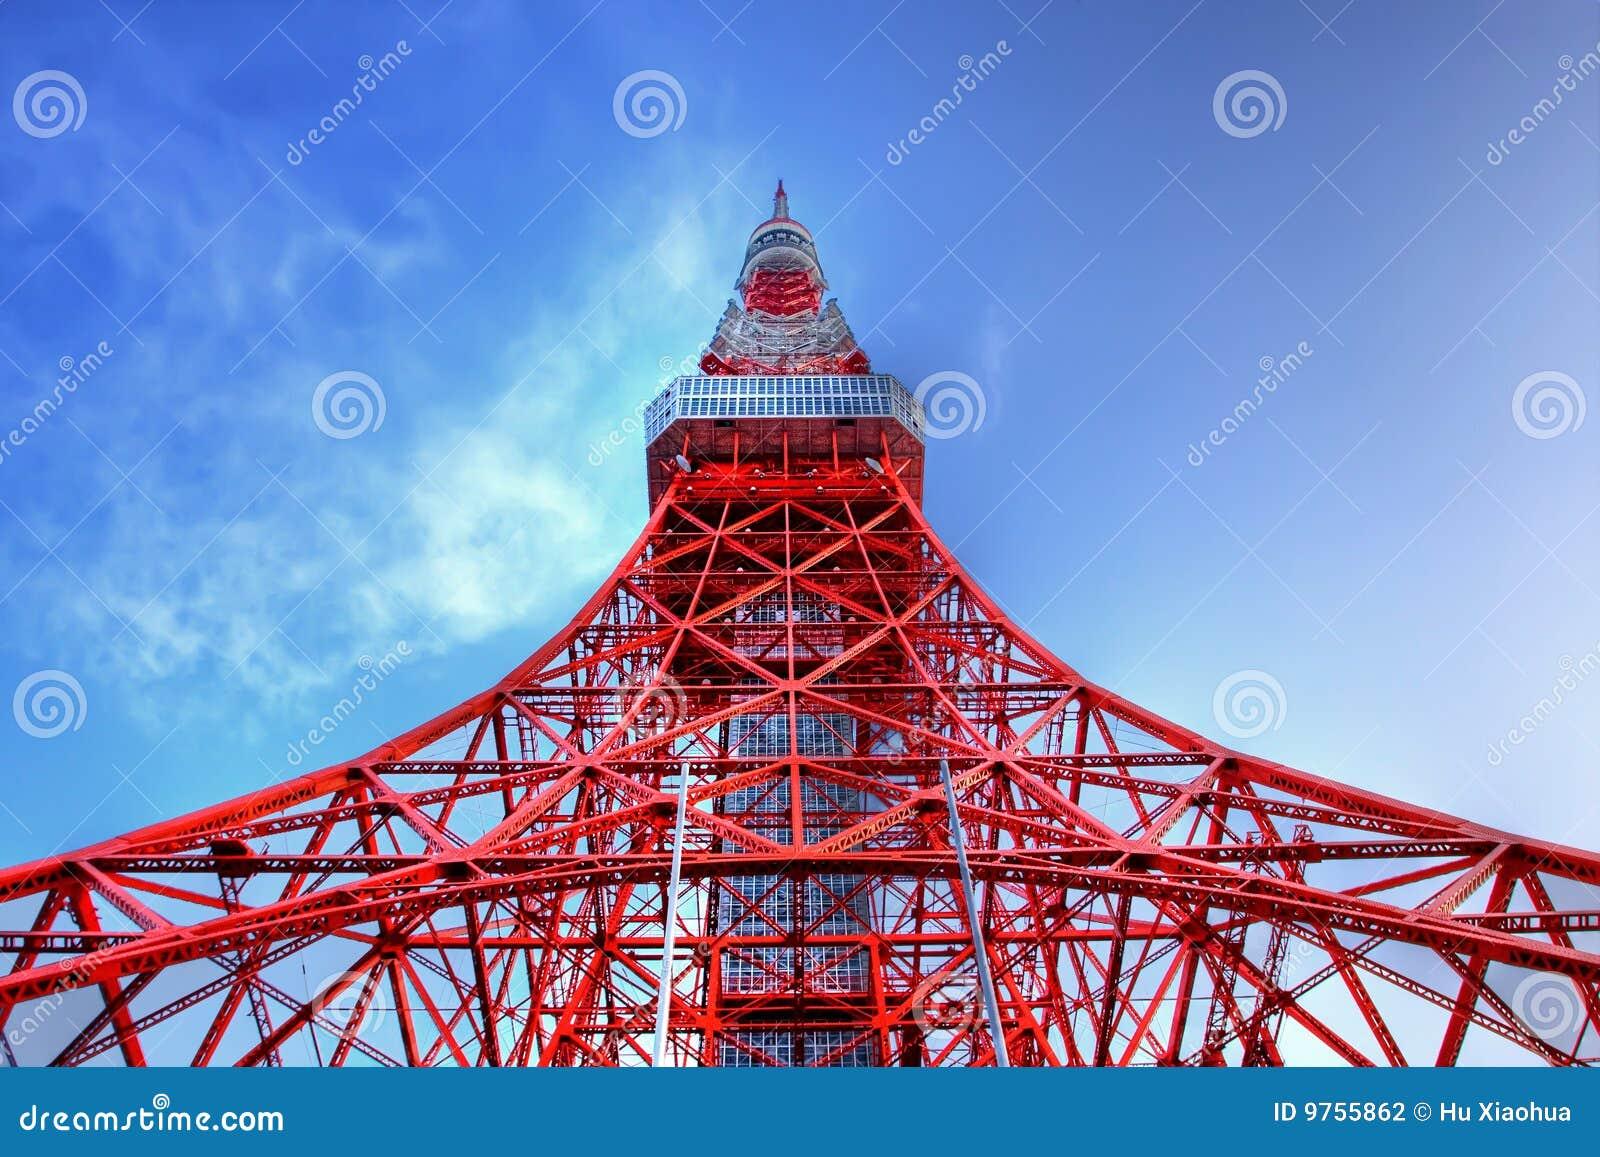 Hdrtokyo torn